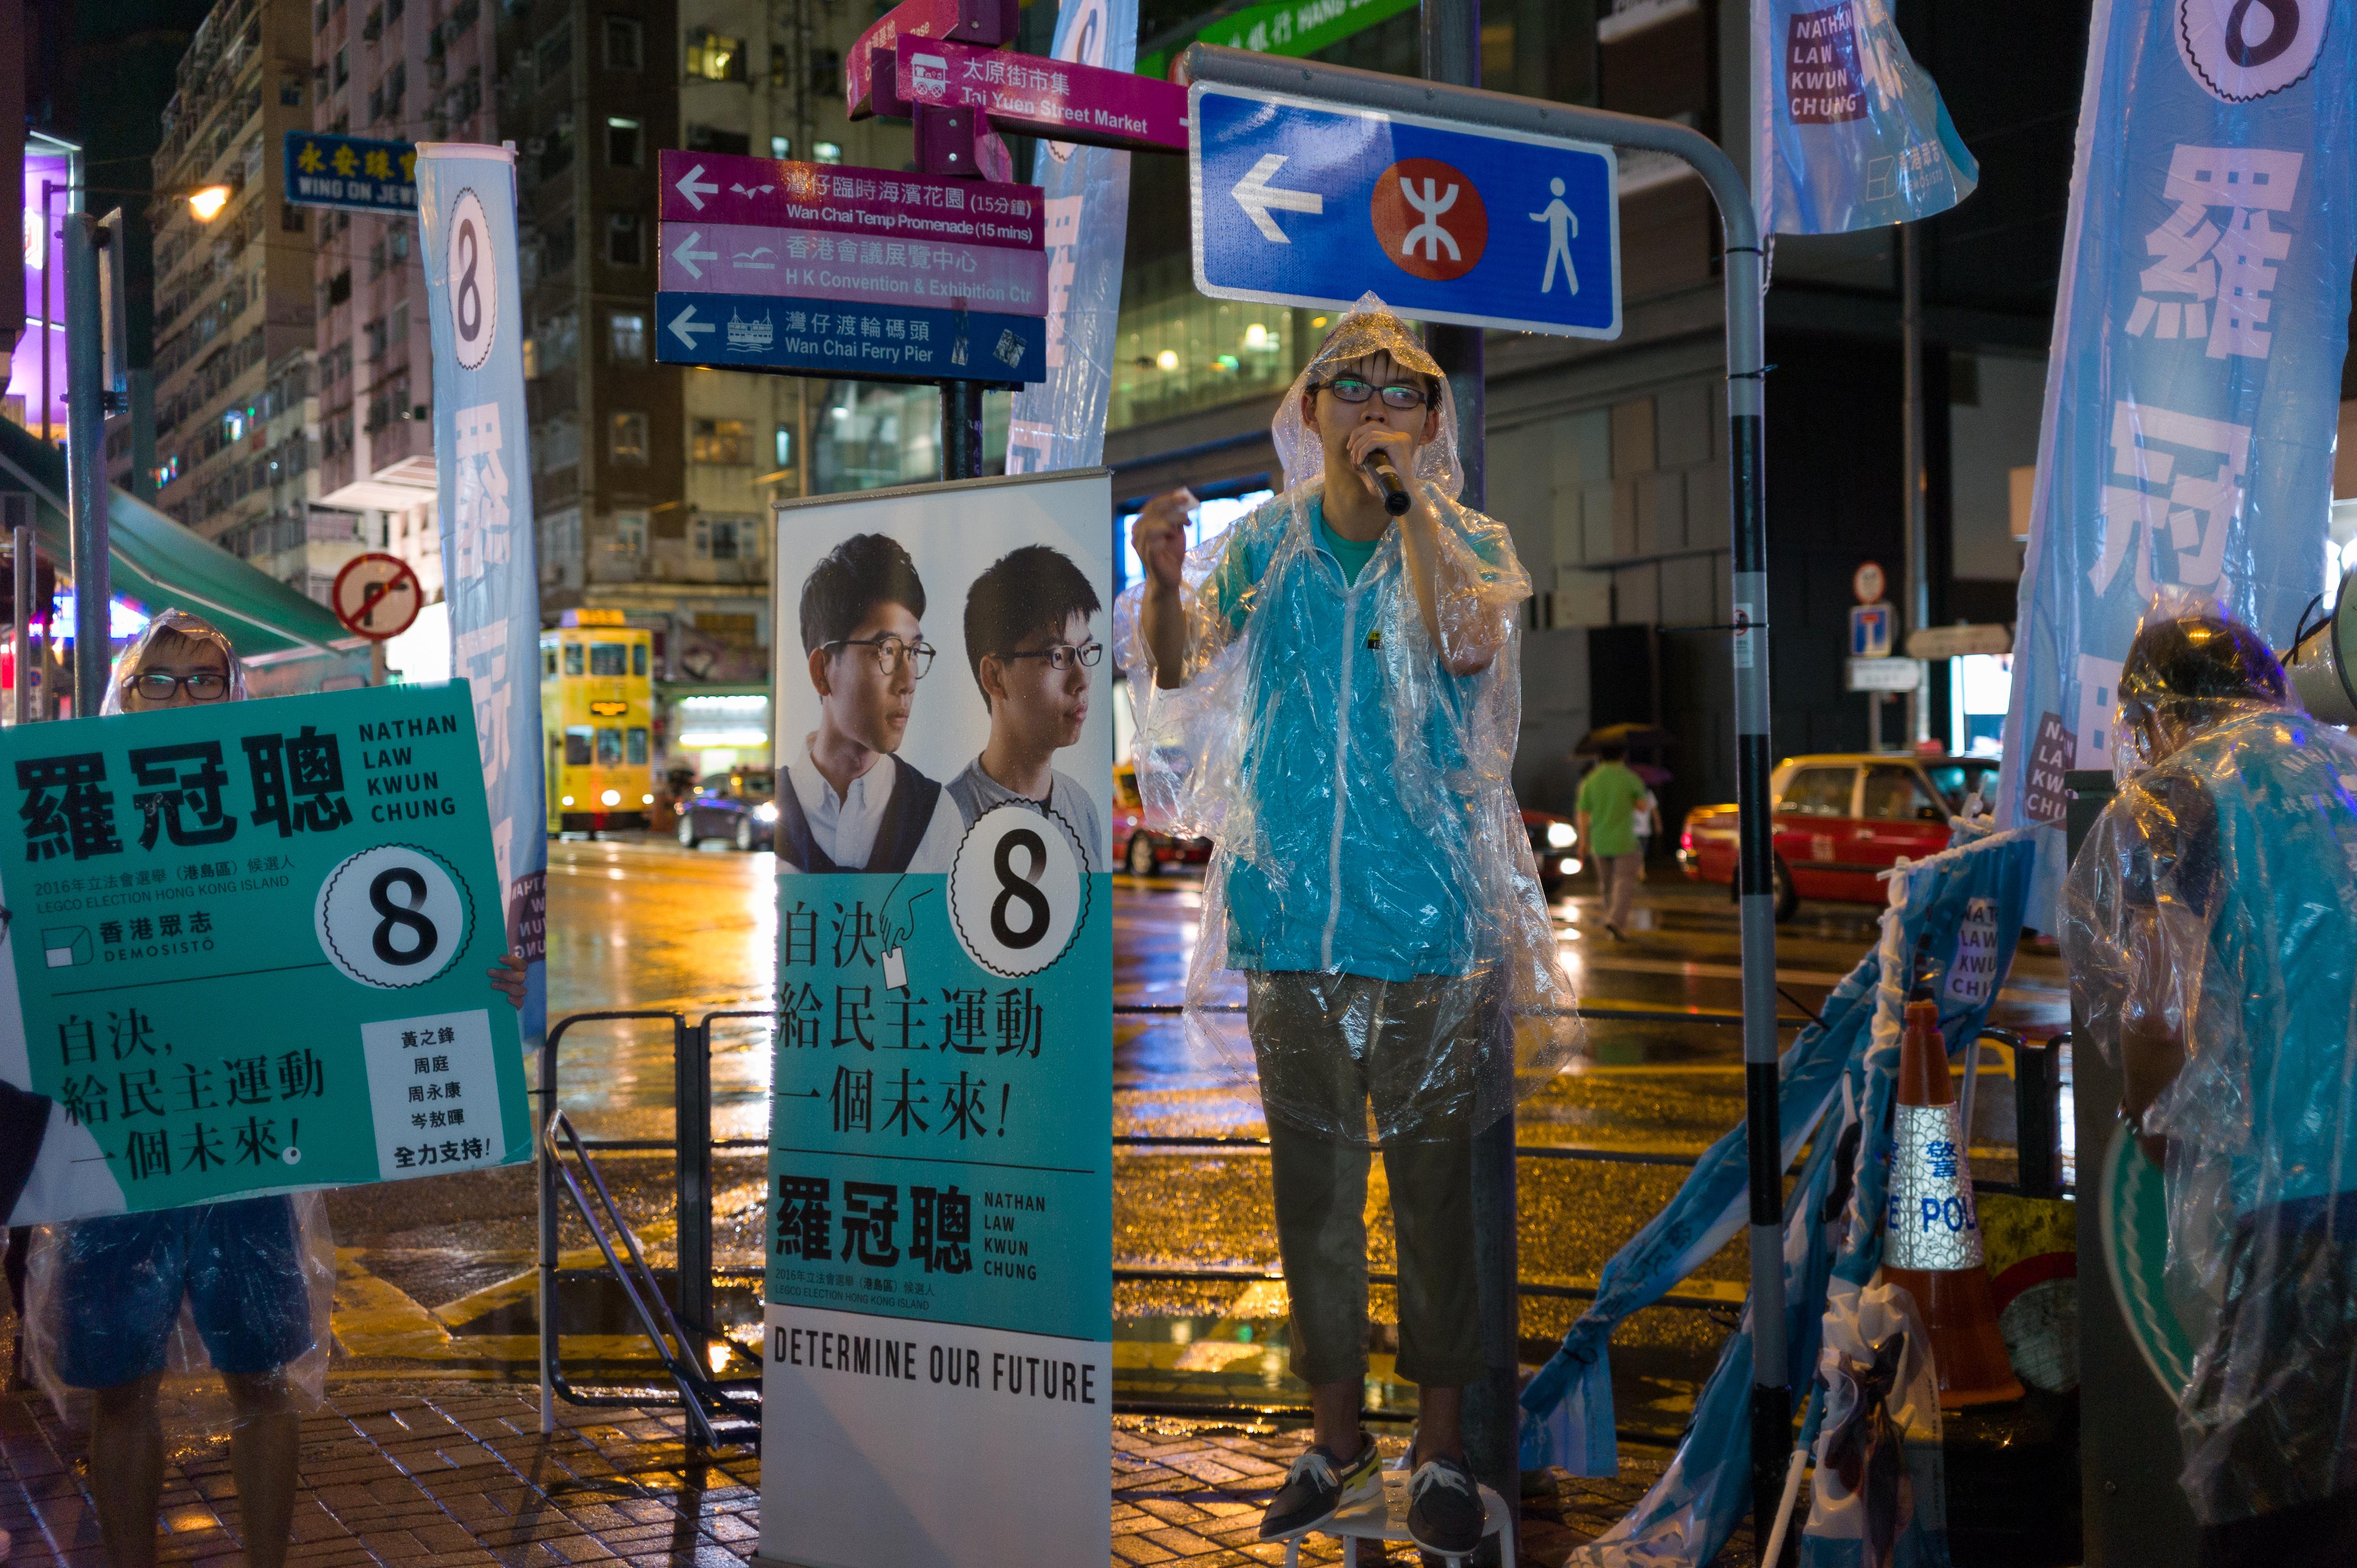 Hong Kong student activist Joshua Wong campaigns for pro-democracy political party Demosisto